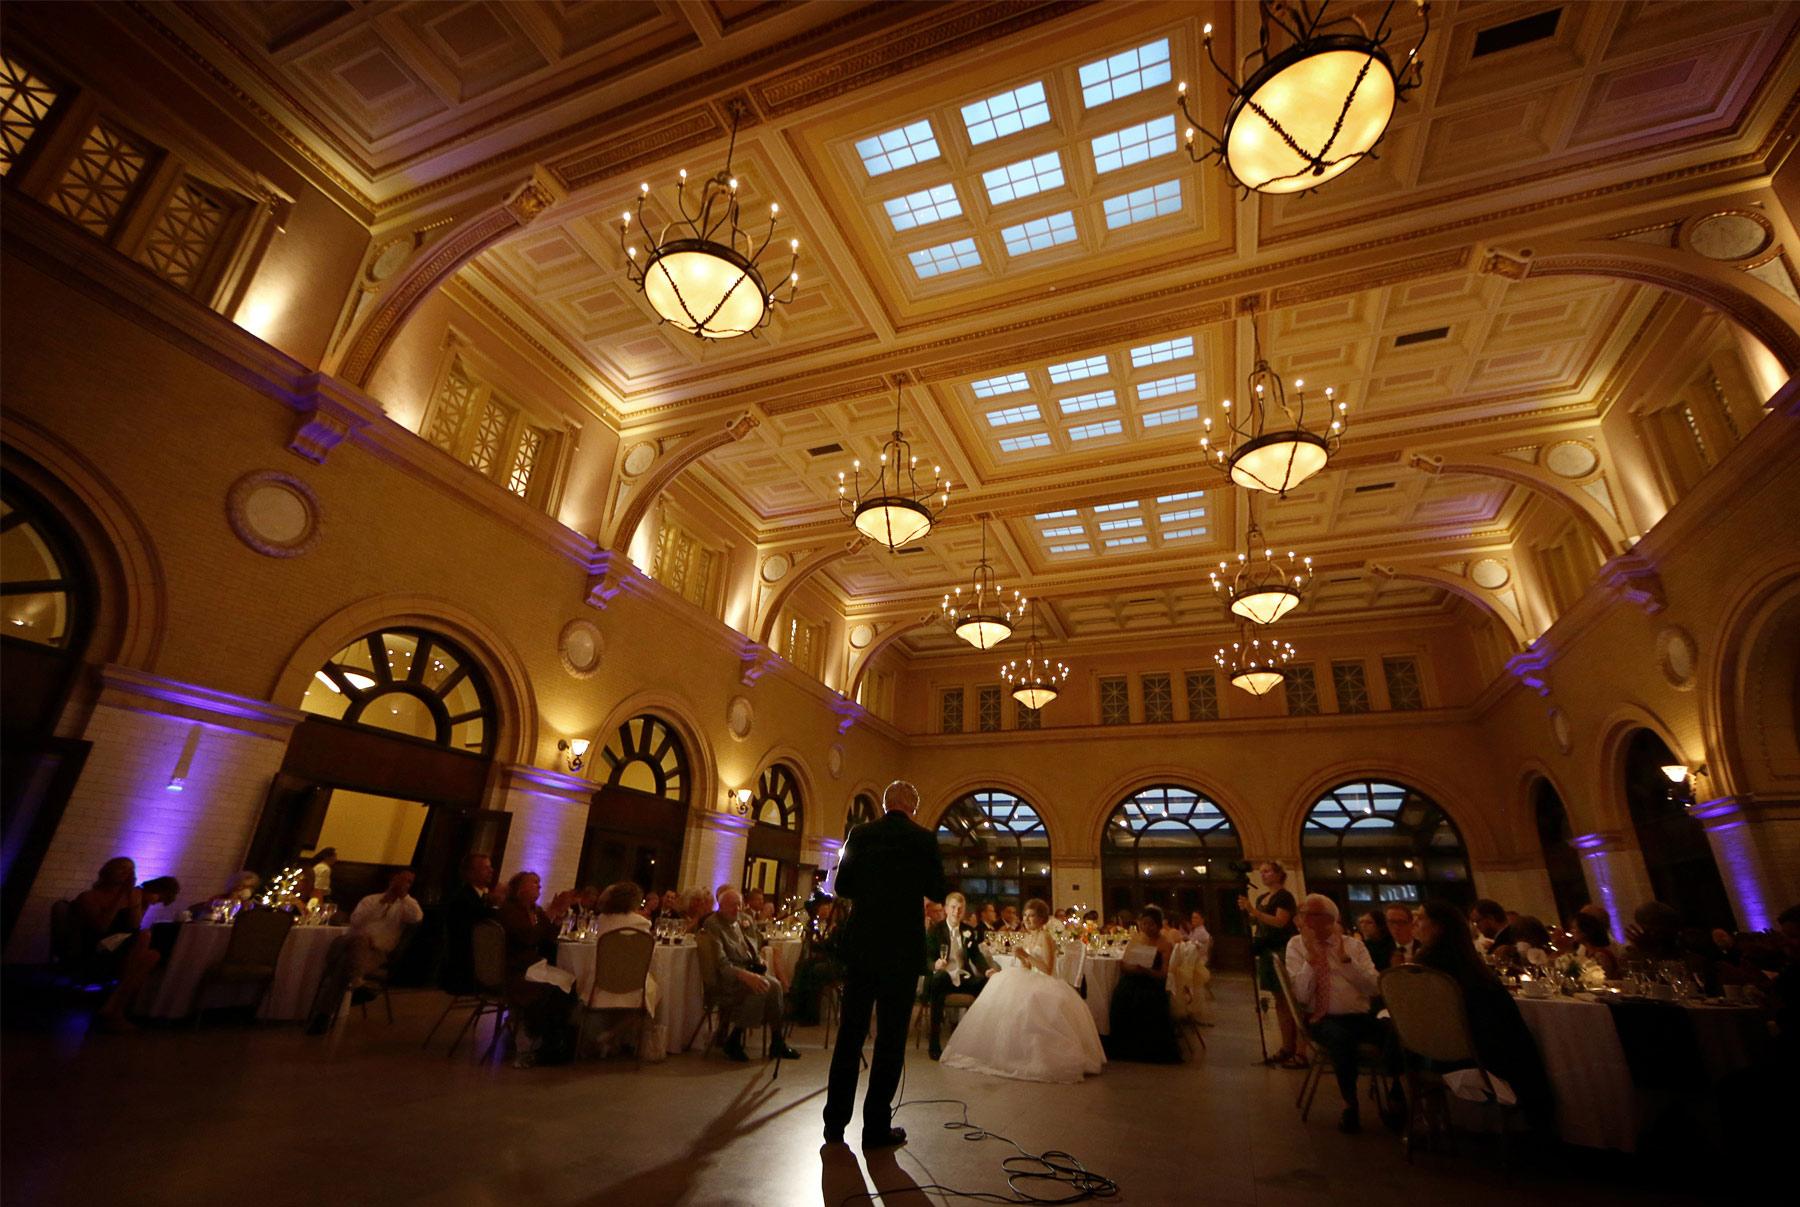 10-Minneapolis-Minnesota-Wedding-Photography-by-Vick-Photography-The-Depot-Reception-Courtney-&-John.jpg